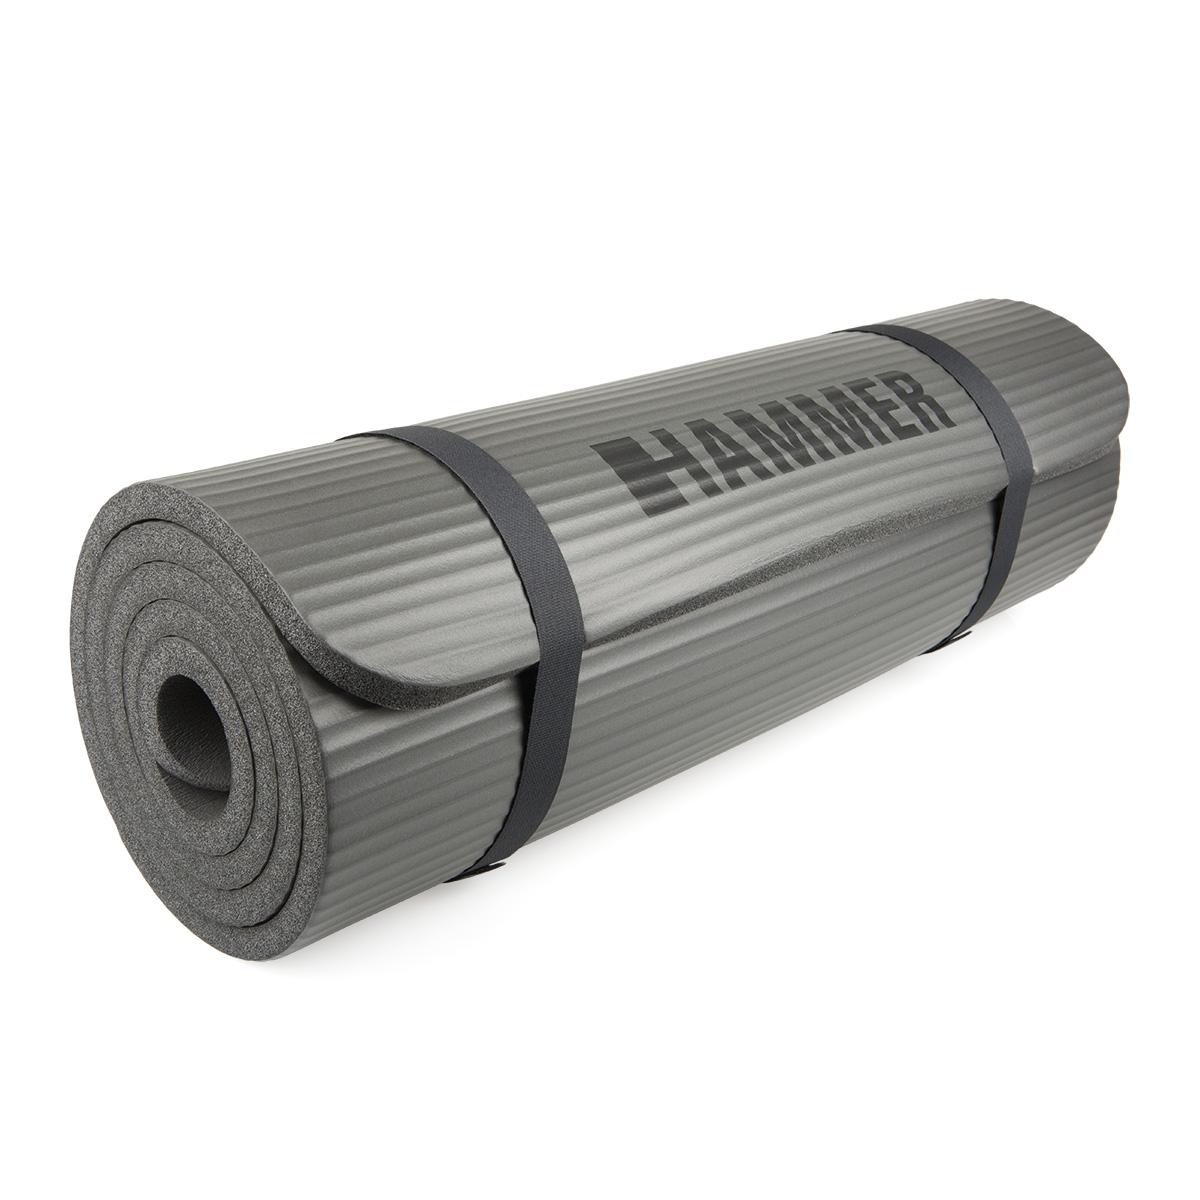 Esterilla Fitness Mat · Producto Finnlo · Fitness · Kukimbia Shop - Tienda Online Deportiva